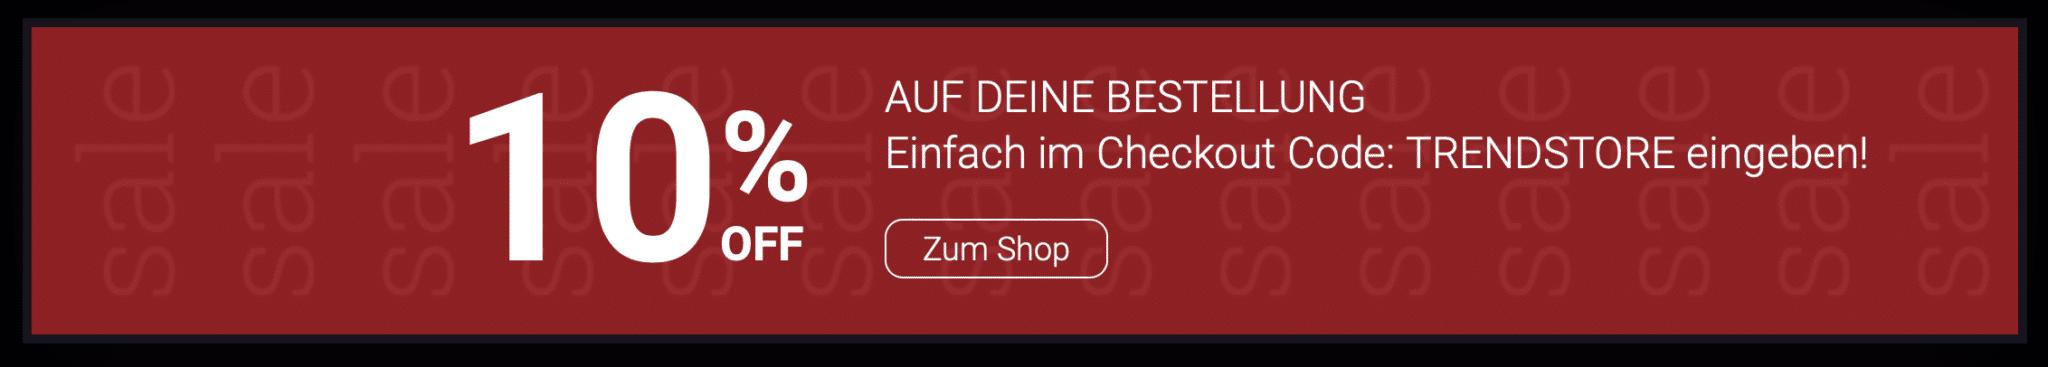 Call to Action des Web Shop Trendstore Villach